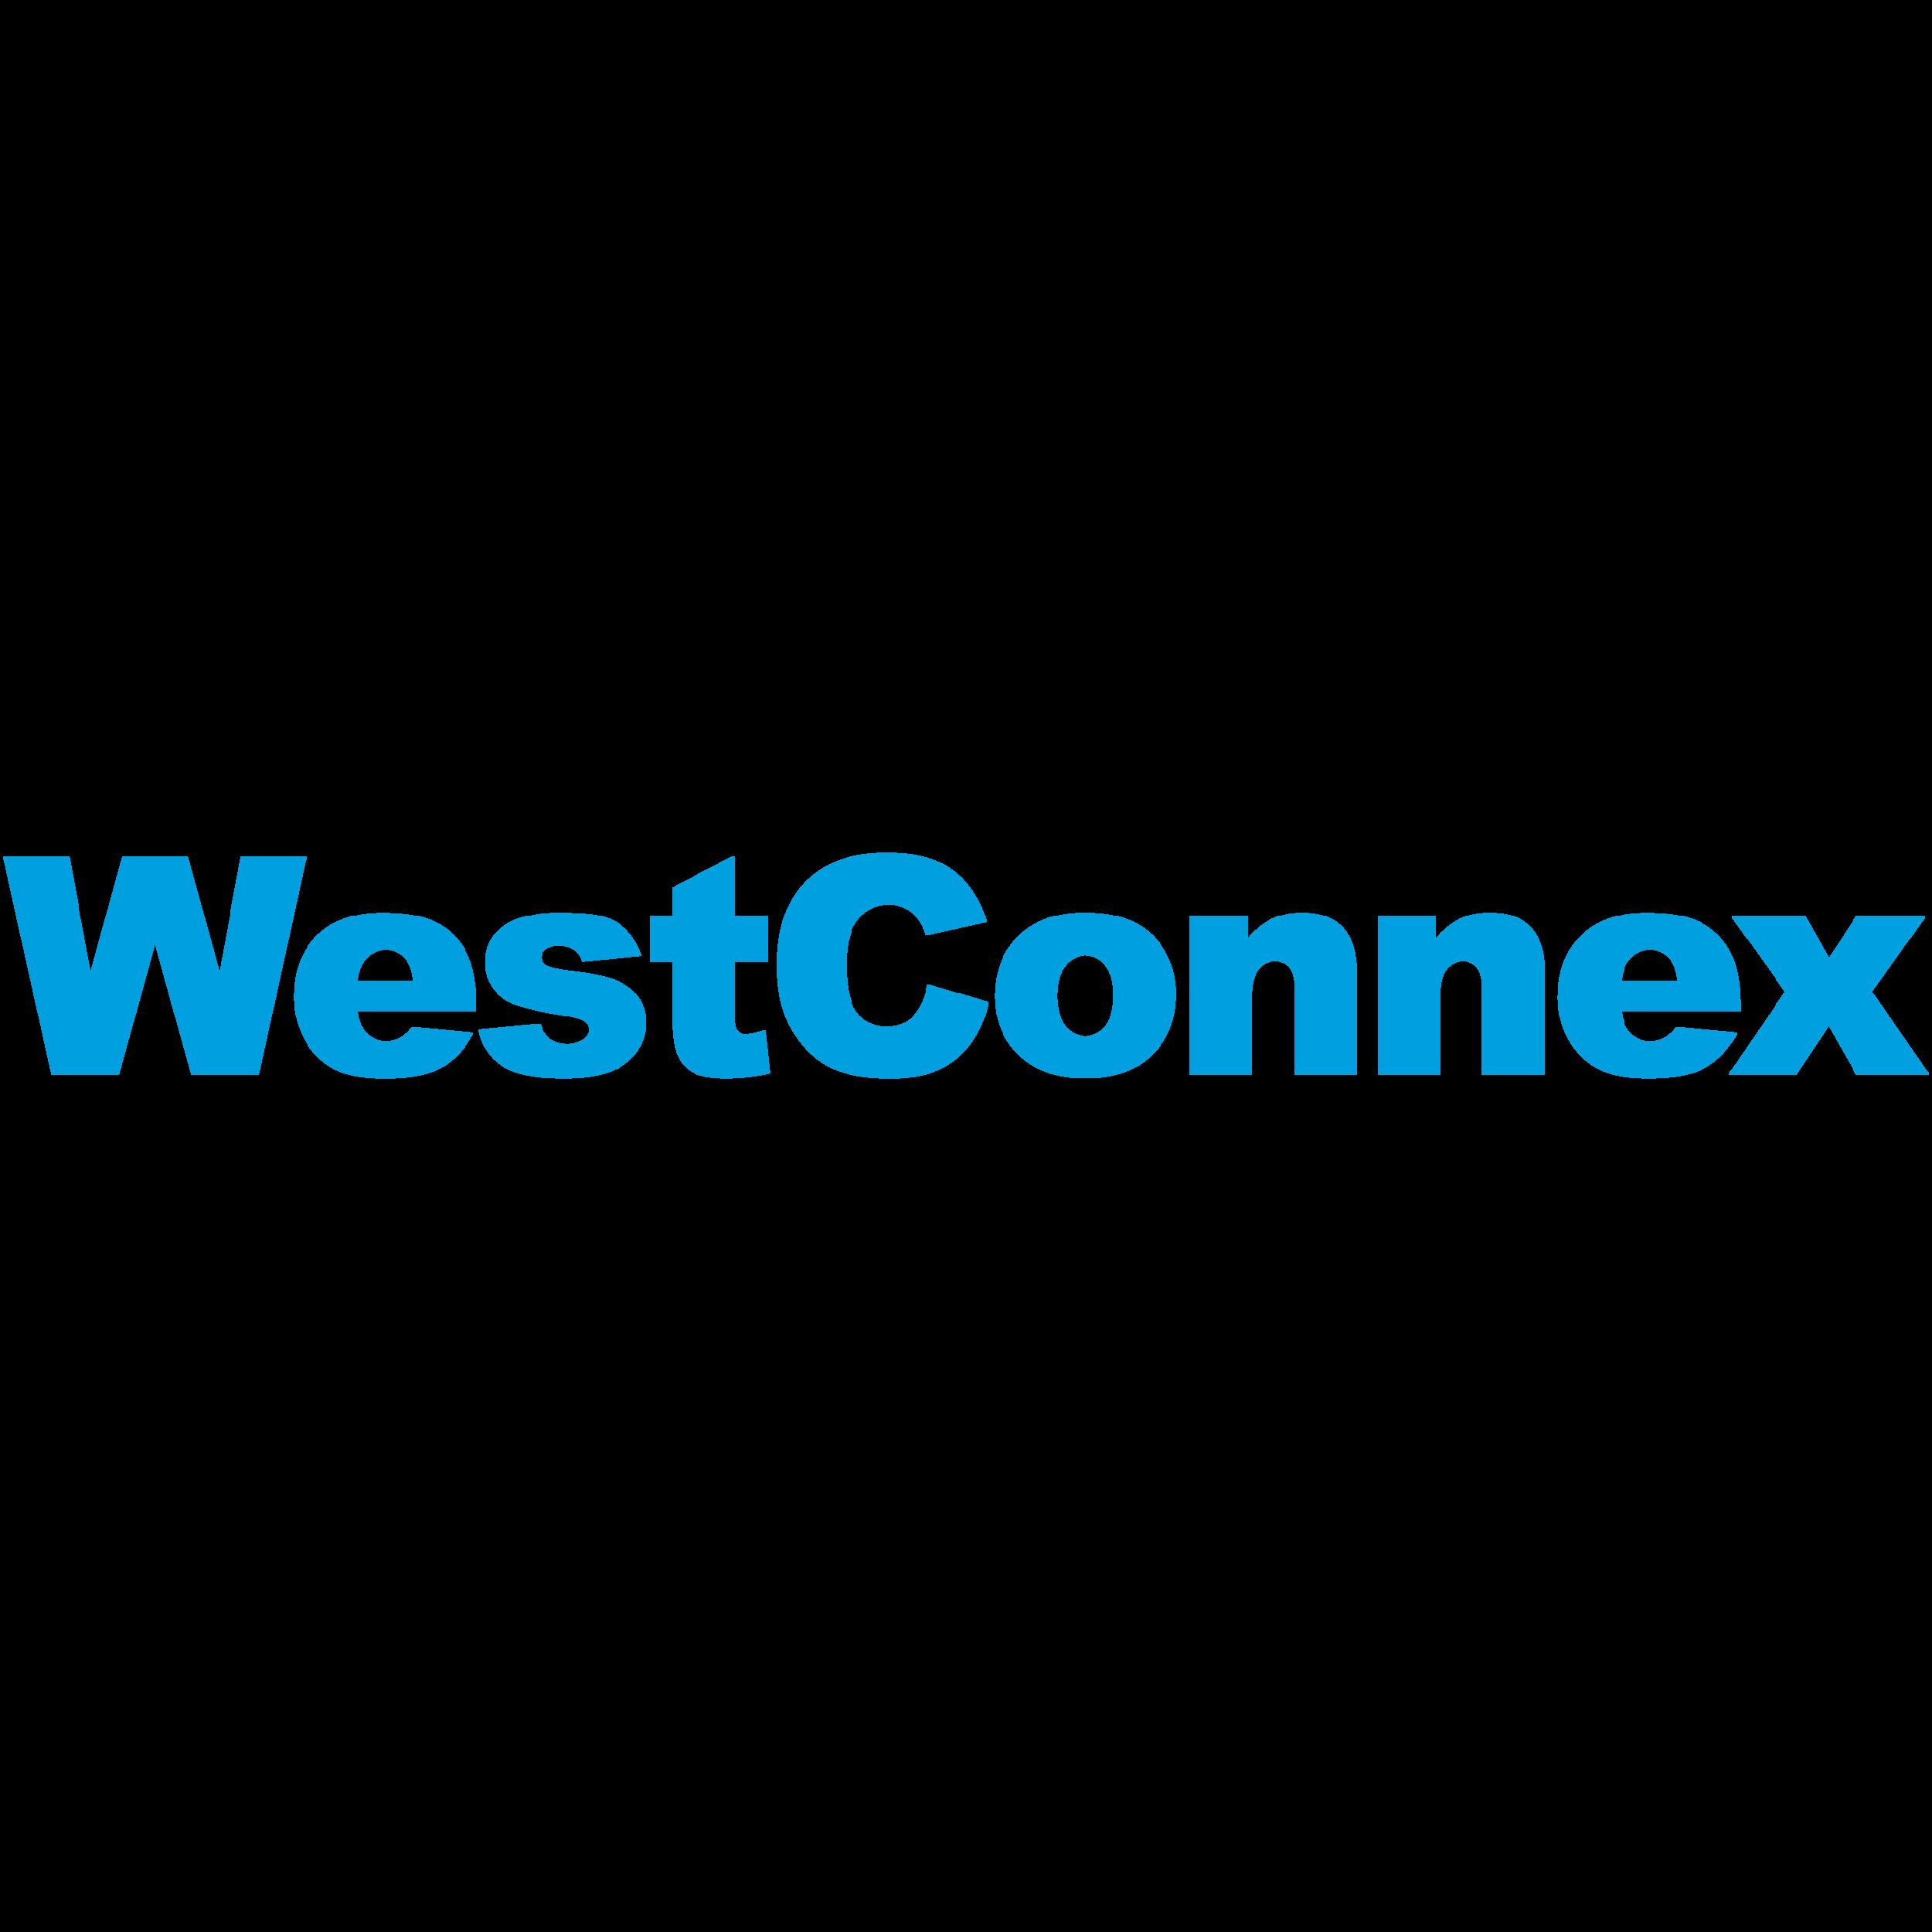 logo-westconnex.png